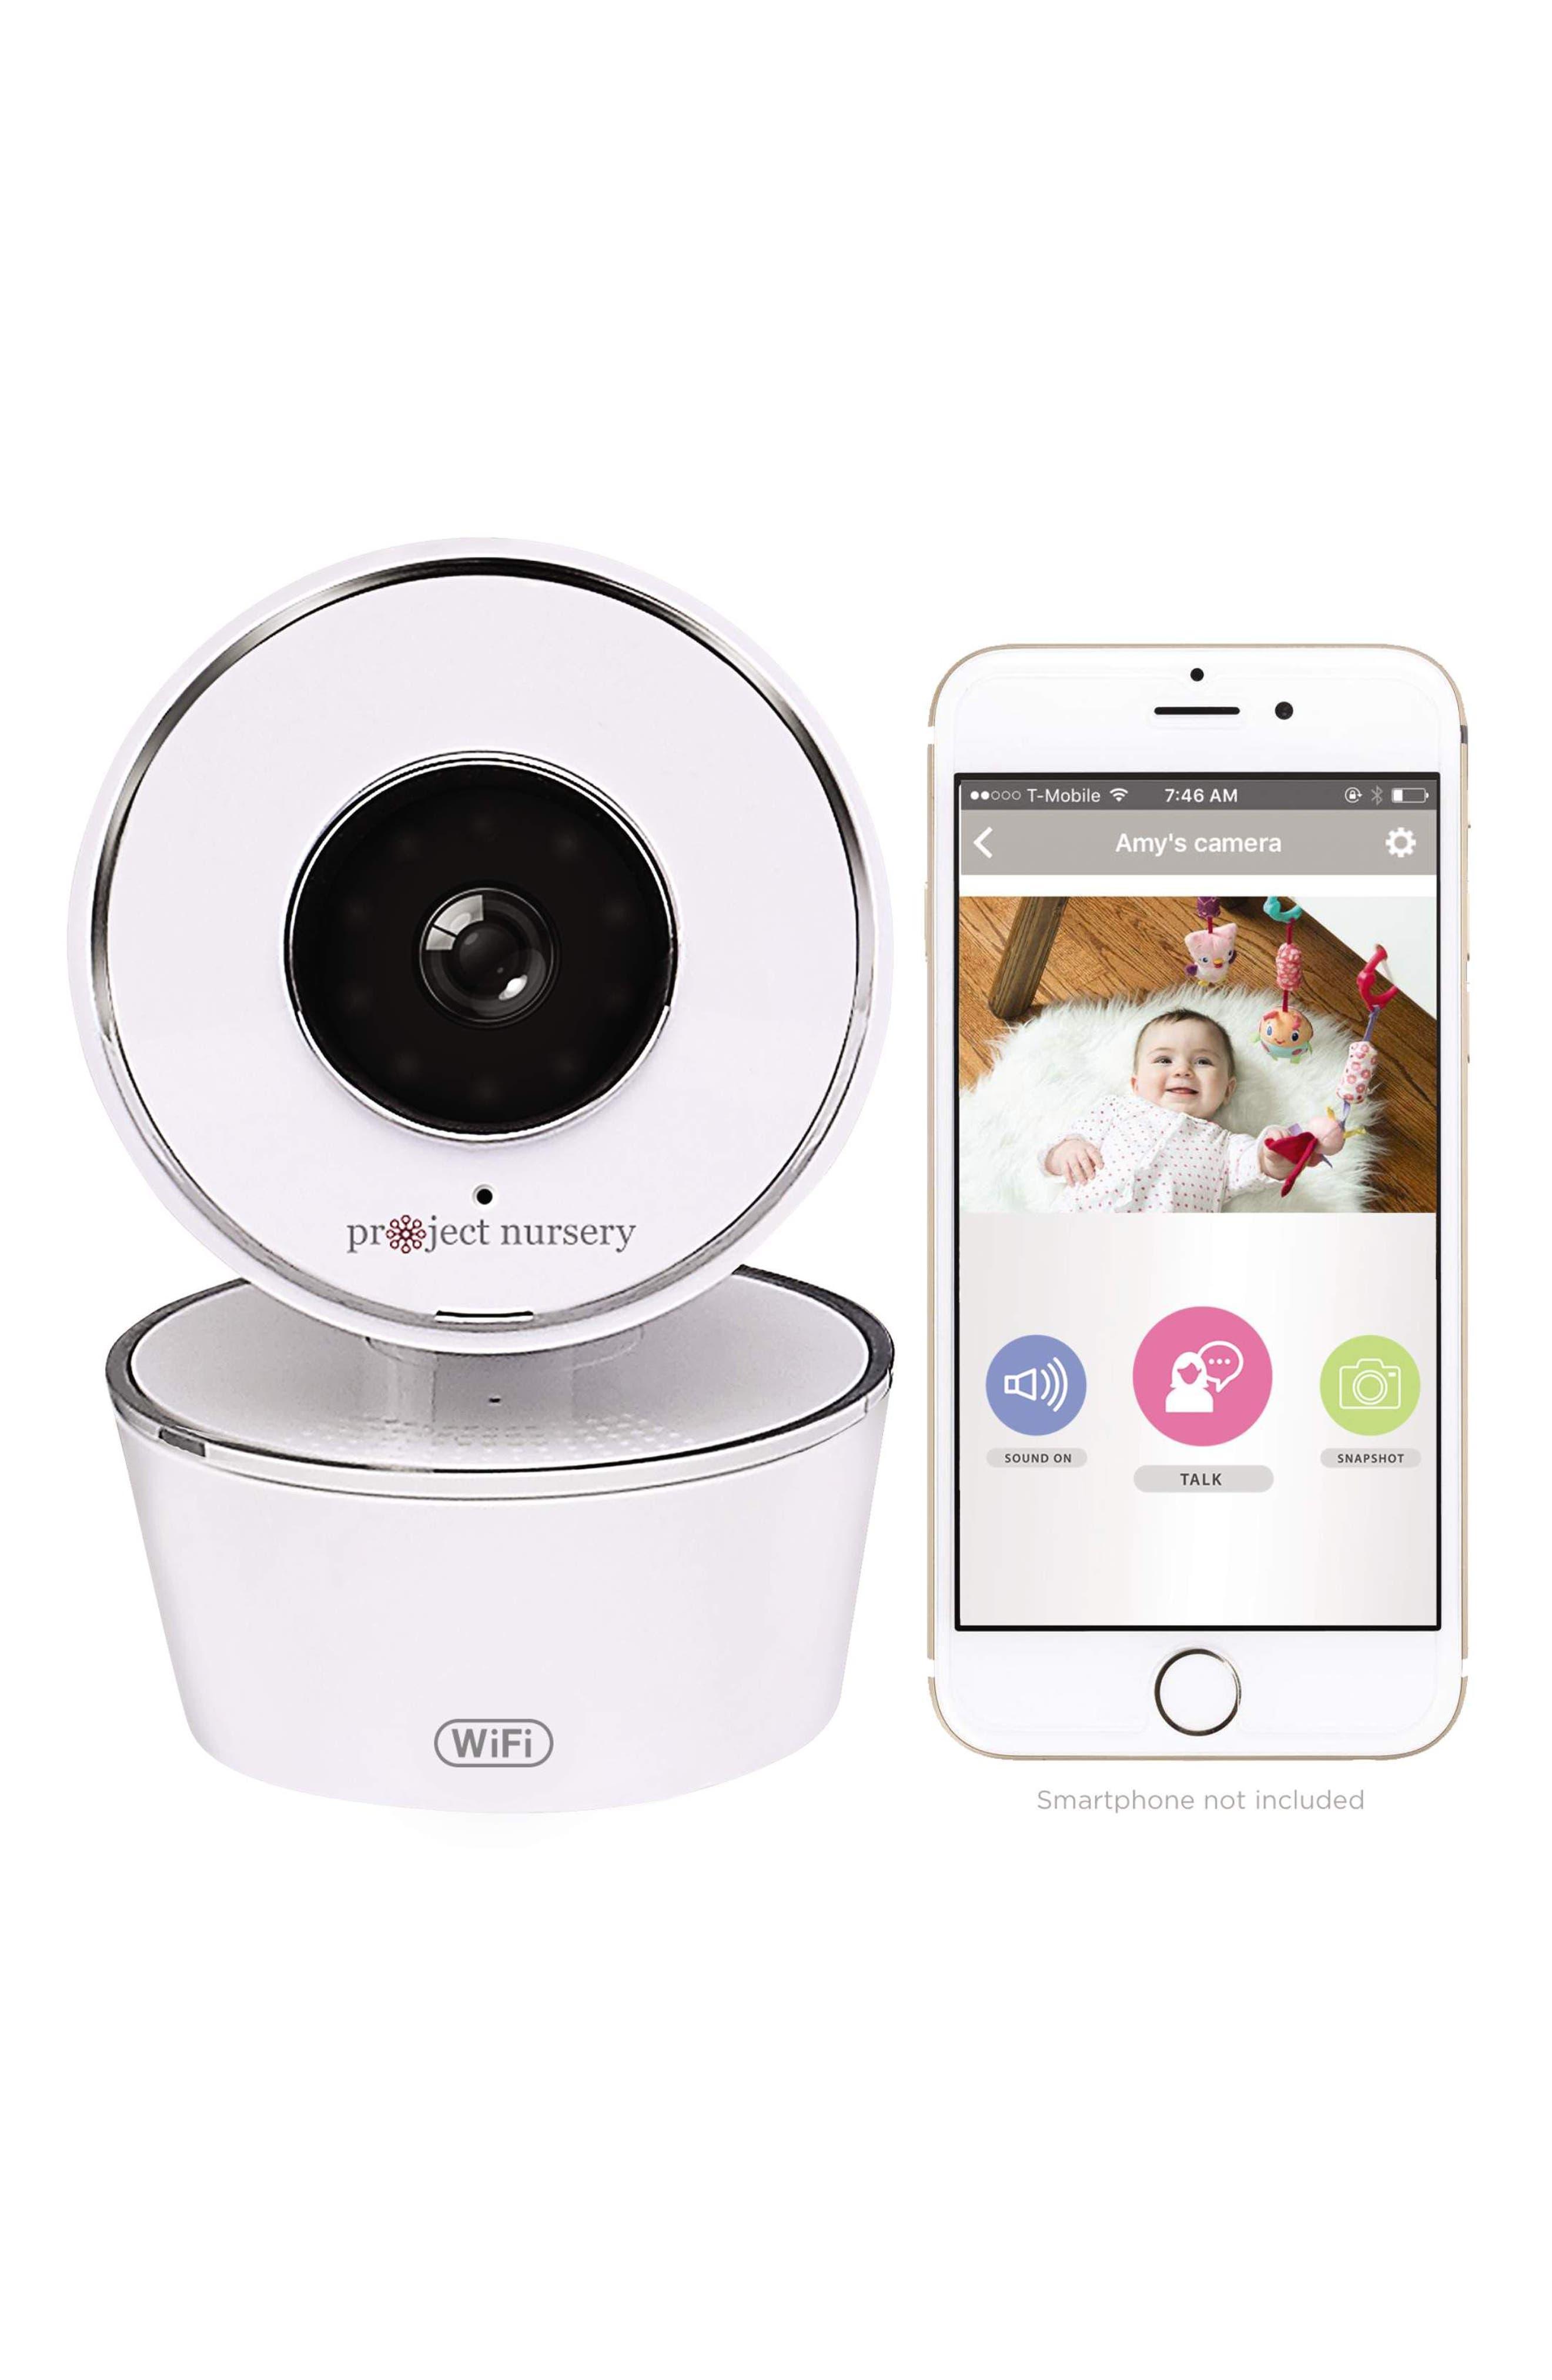 Smart Nursery Wi-Fi Baby Monitor,                             Main thumbnail 1, color,                             WHITE